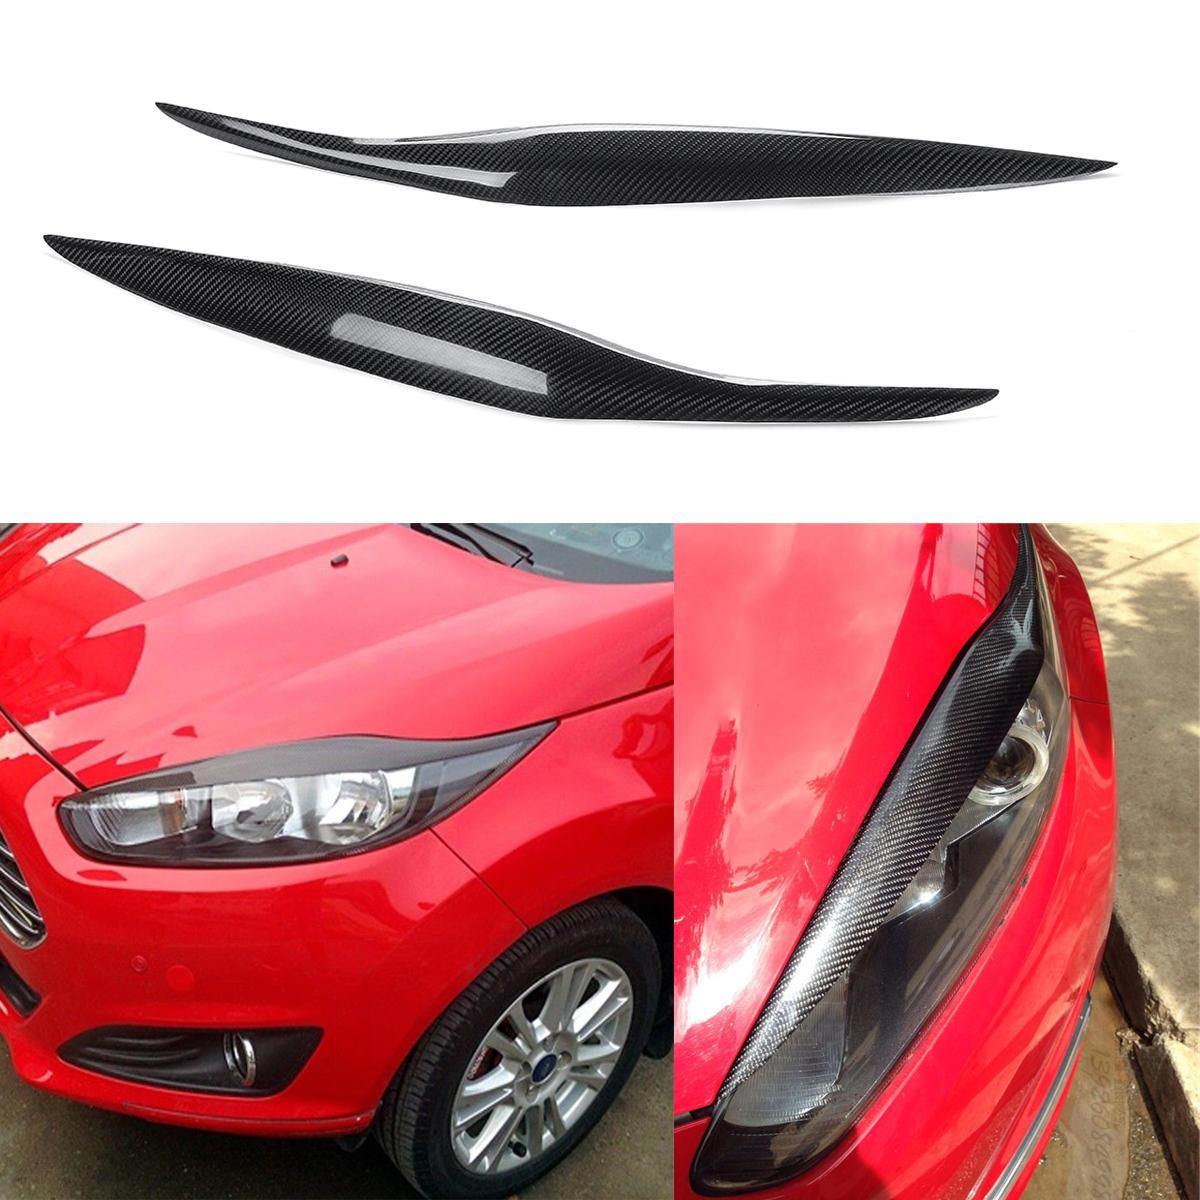 Fibra de carbono del faro del coche ceja párpados para Ford Fiesta MK7.5 2012-2017 MK8 2013-2016